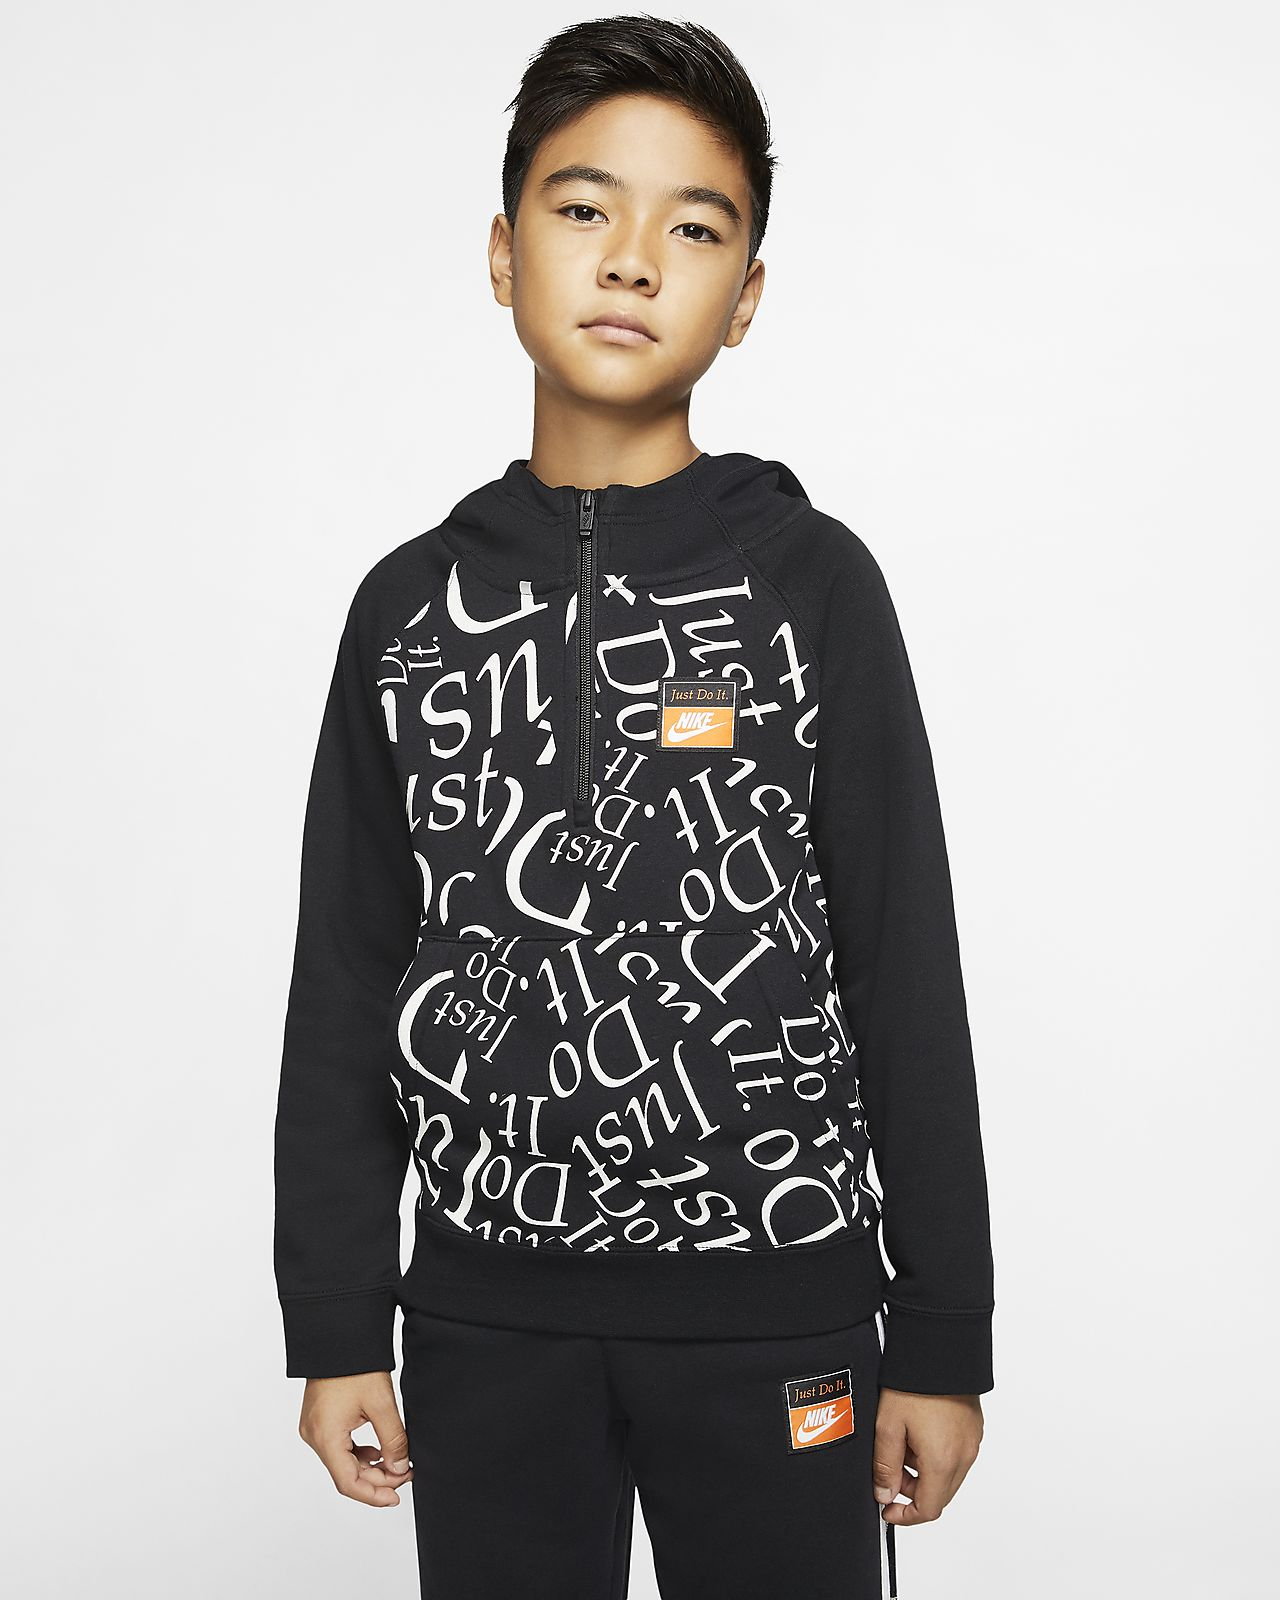 Nike Sportswear 大童(男孩)半长拉链开襟连帽衫